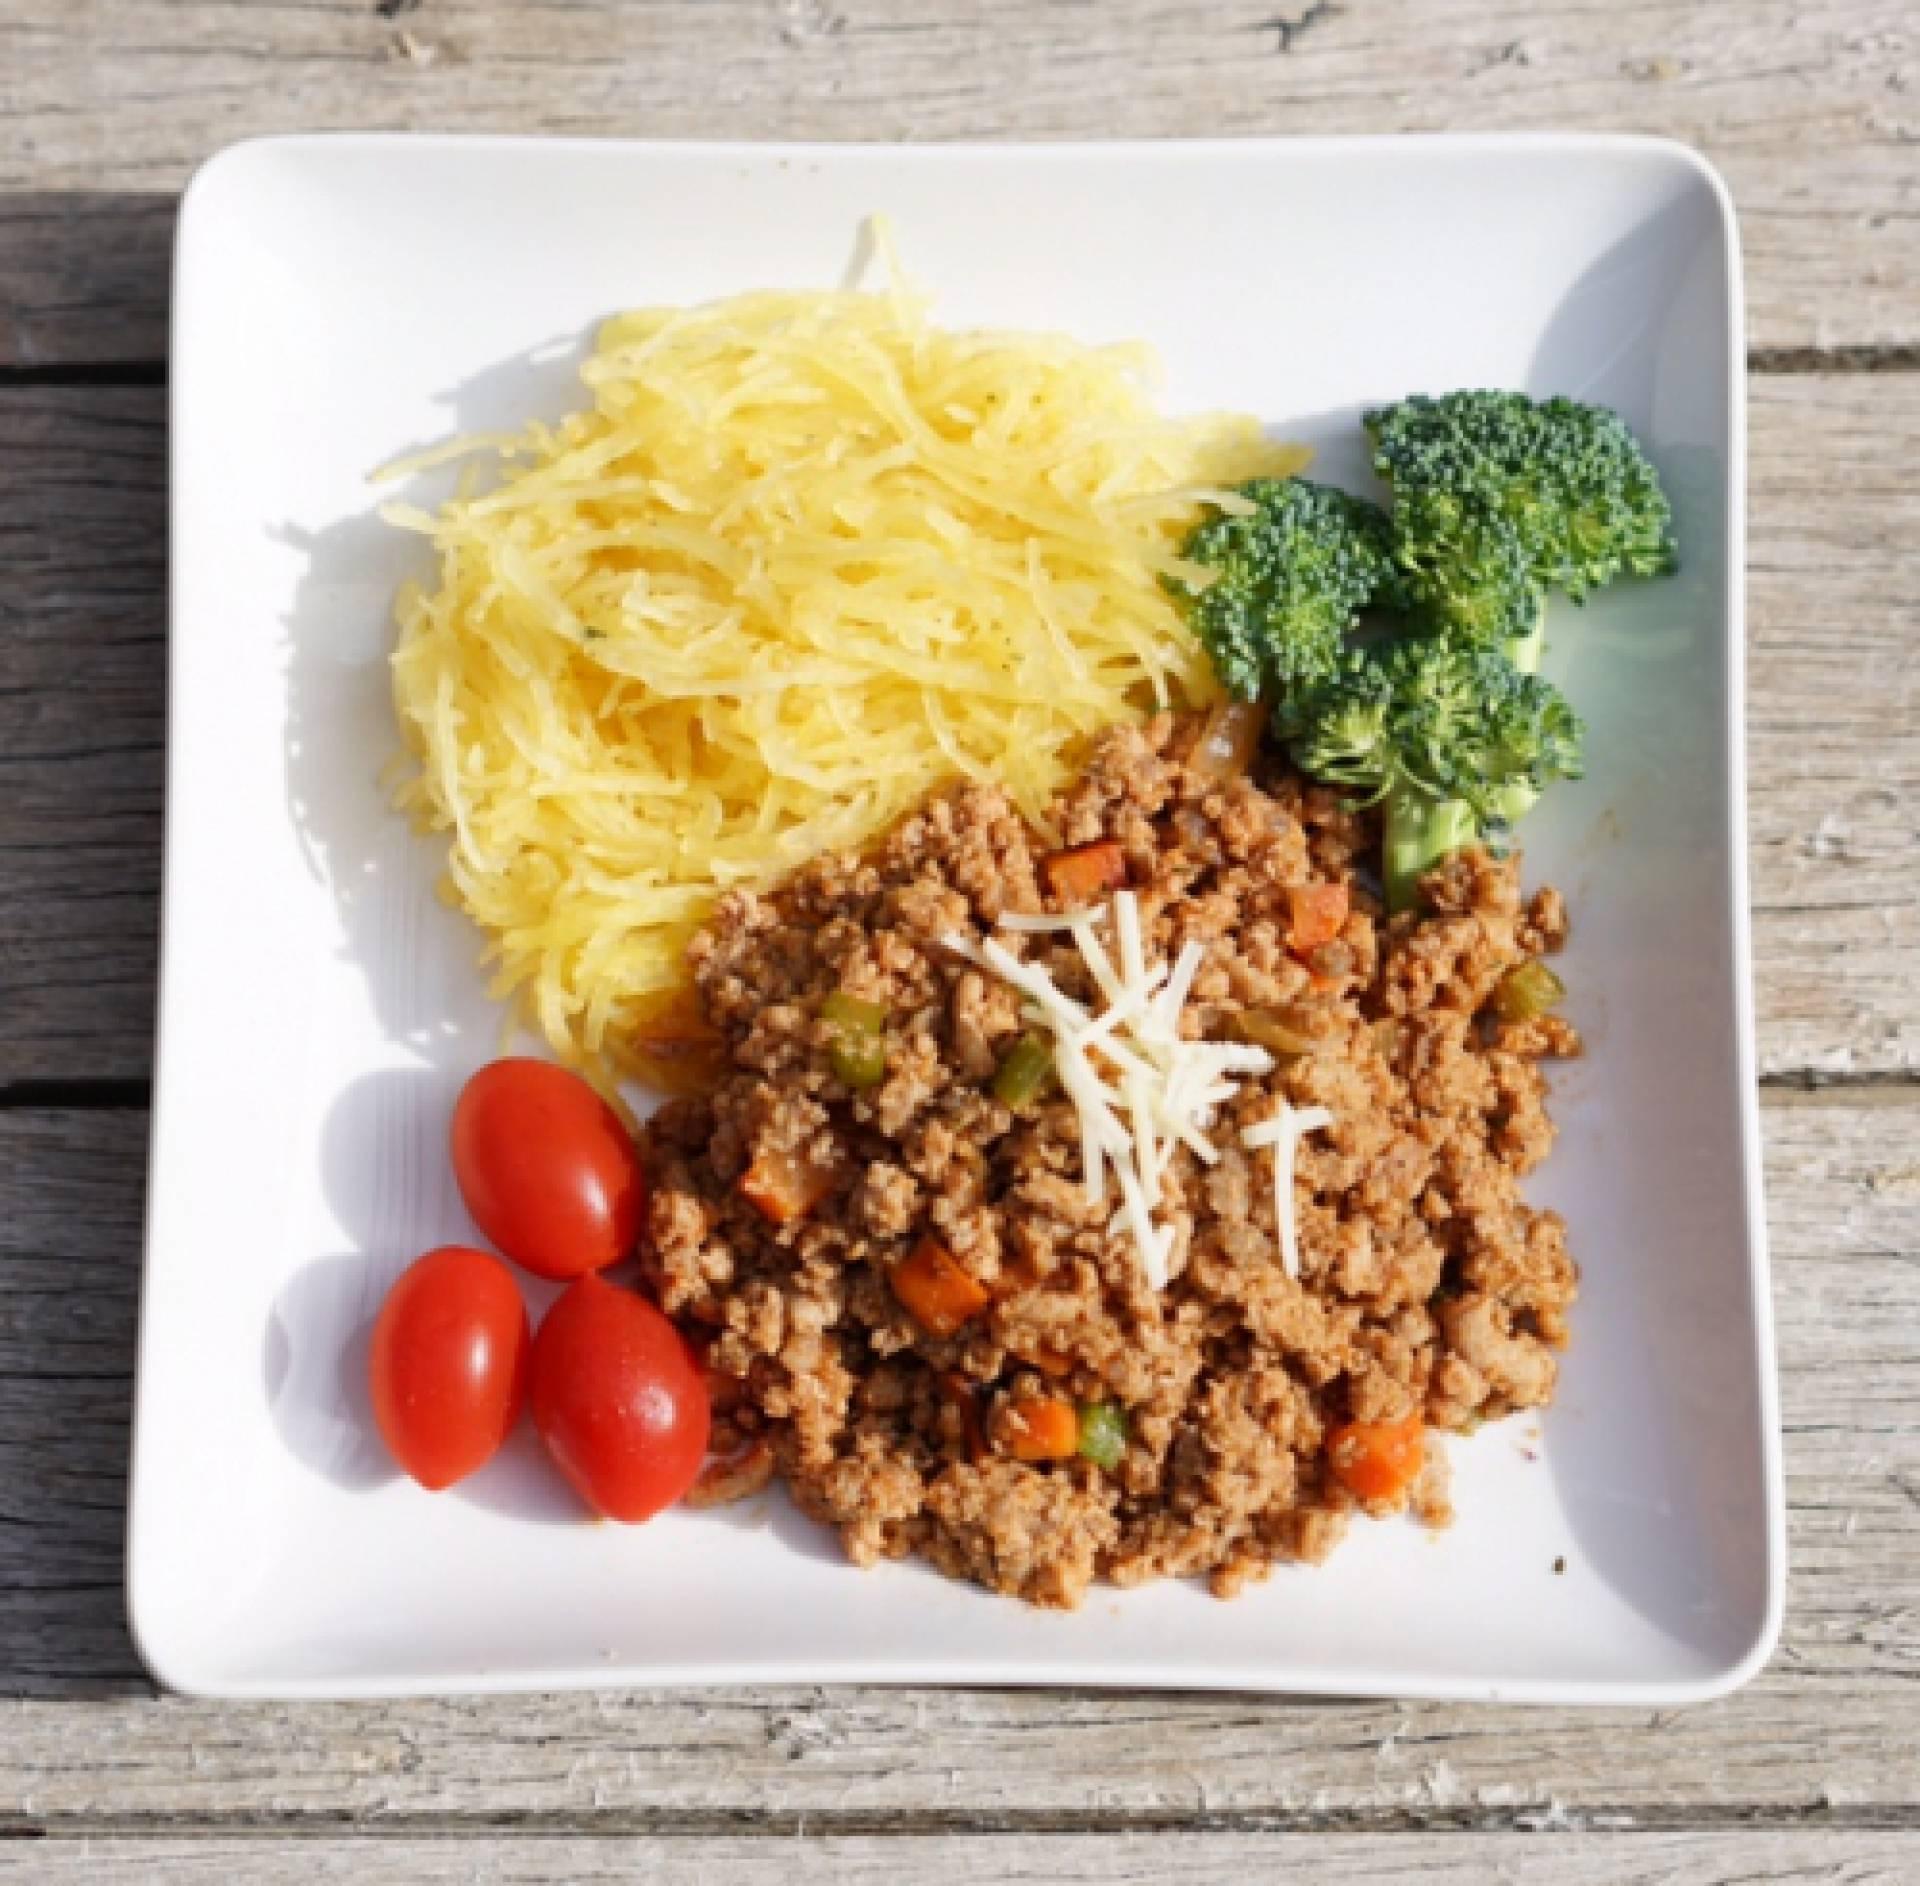 KETO Lean Turkey Bolognese over Spaghetti Squash